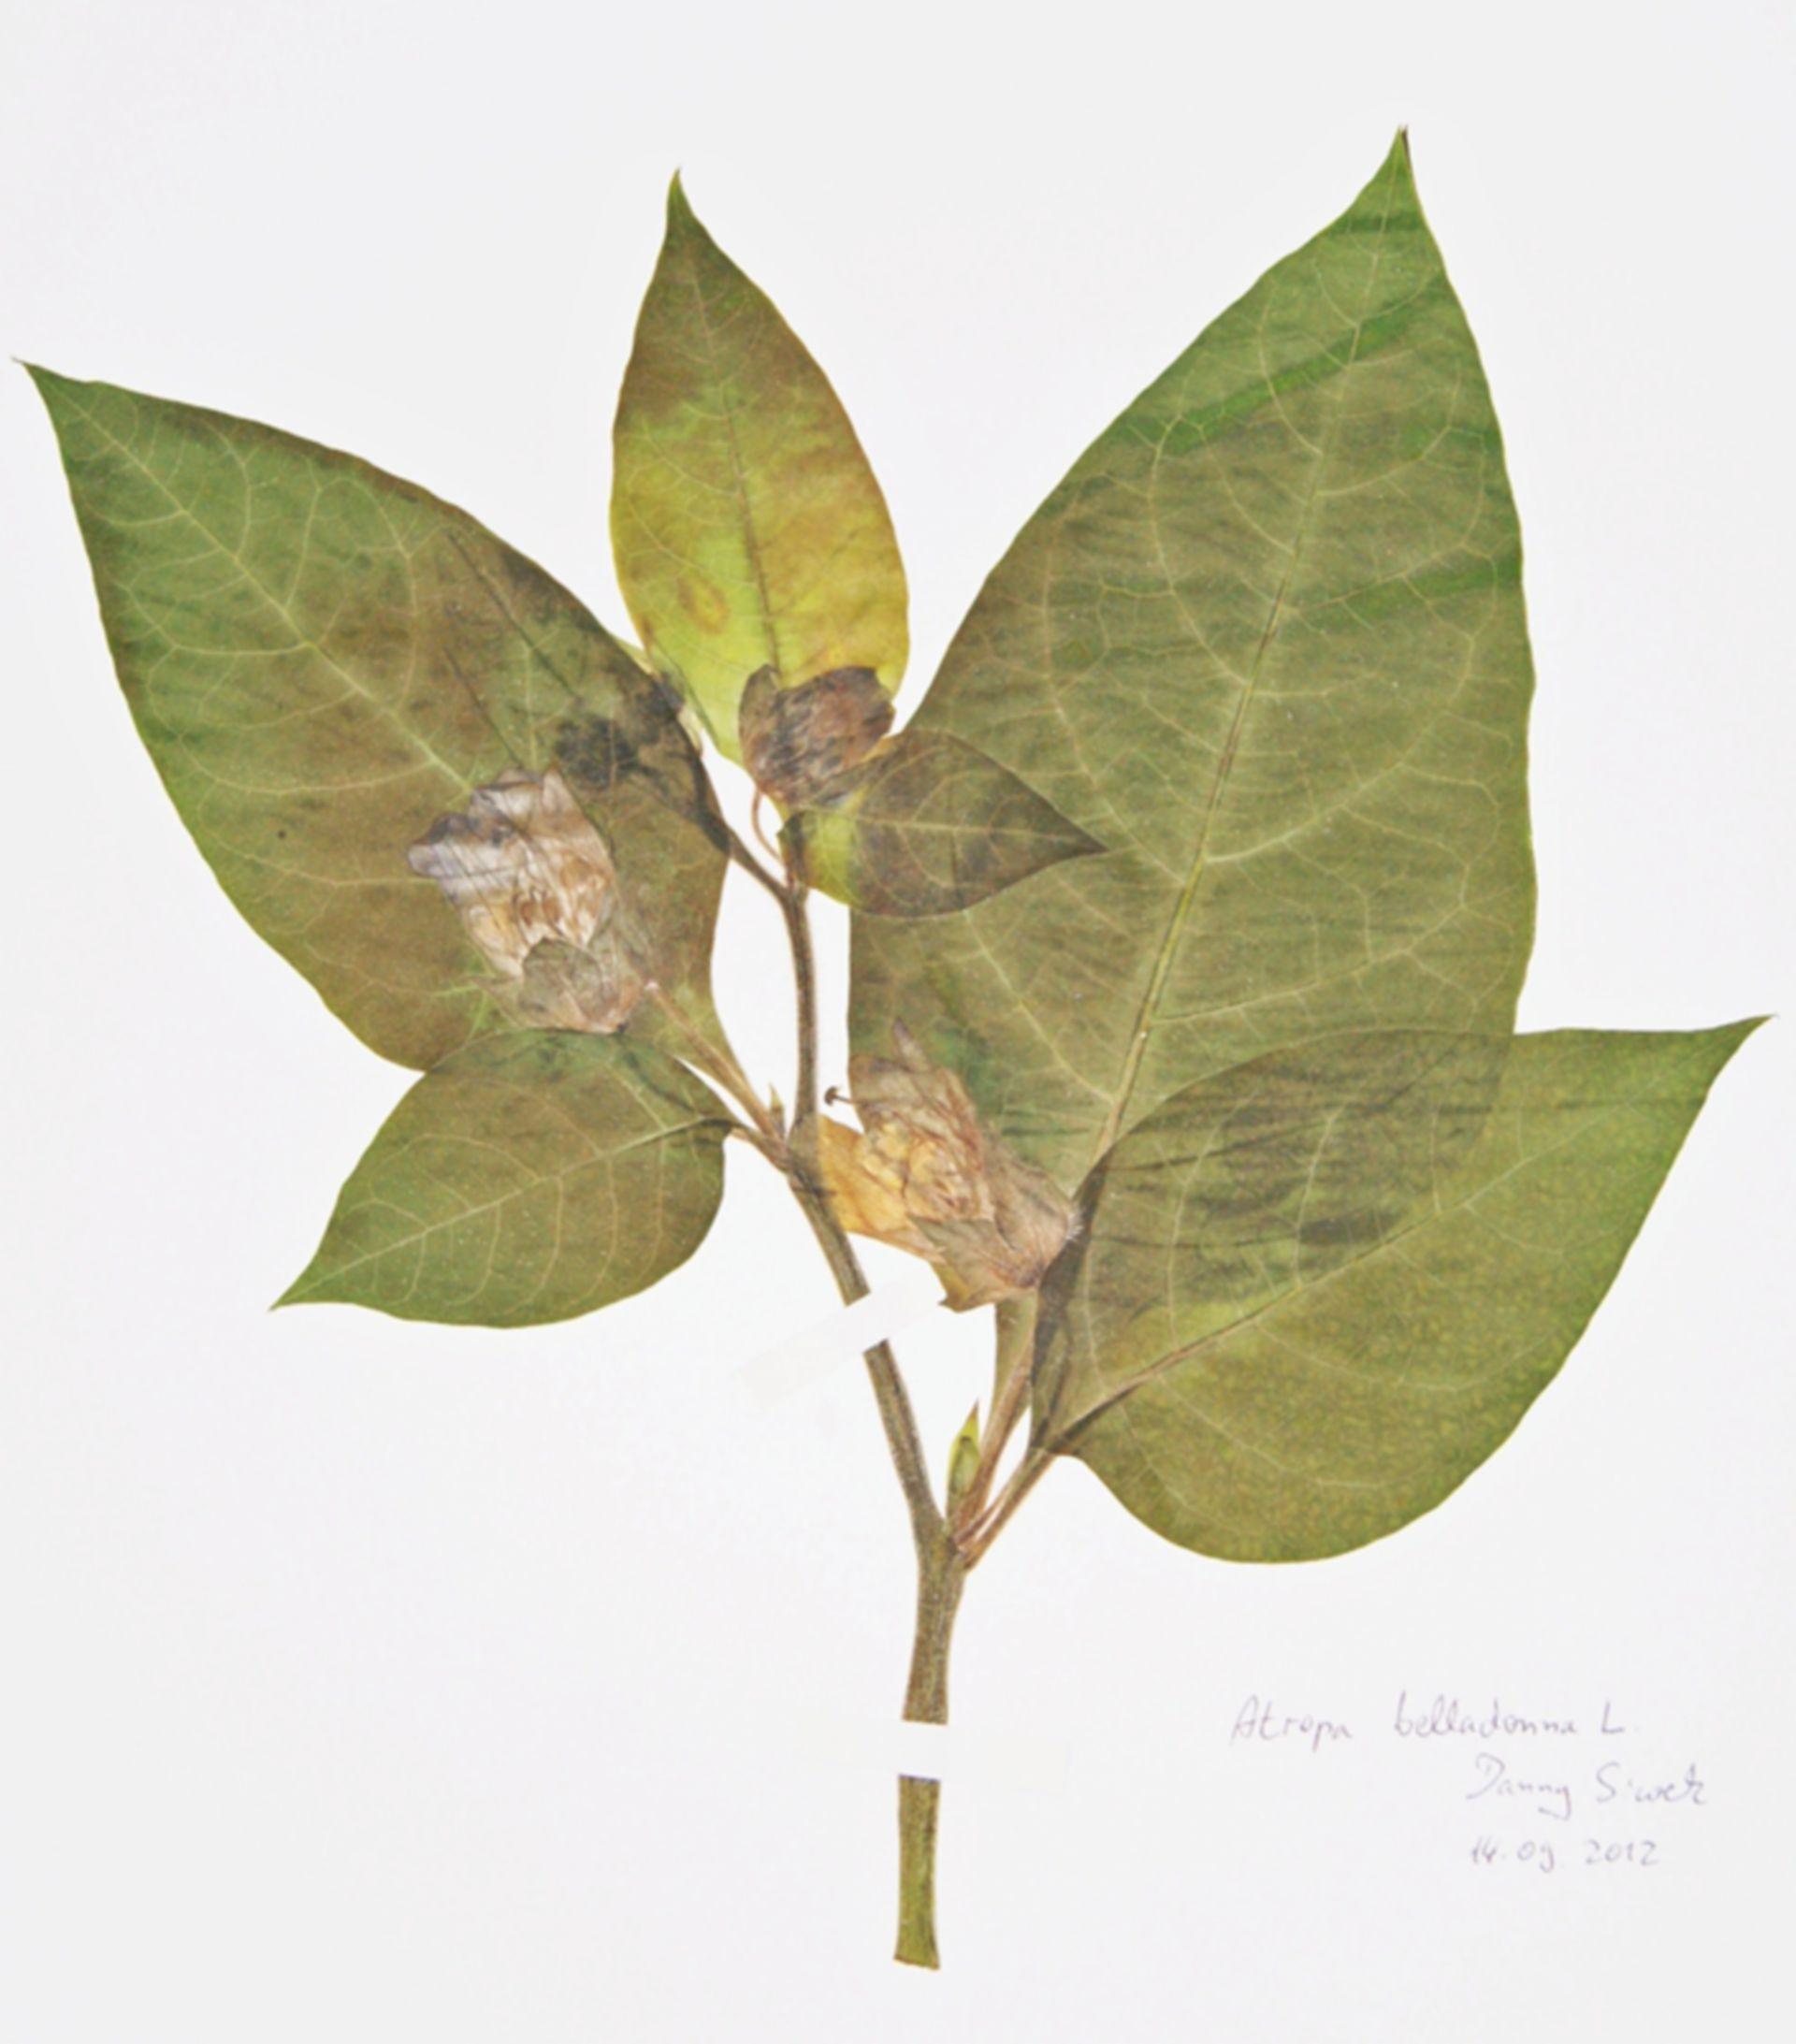 Atropa bella-donna L. Herbarbeleg